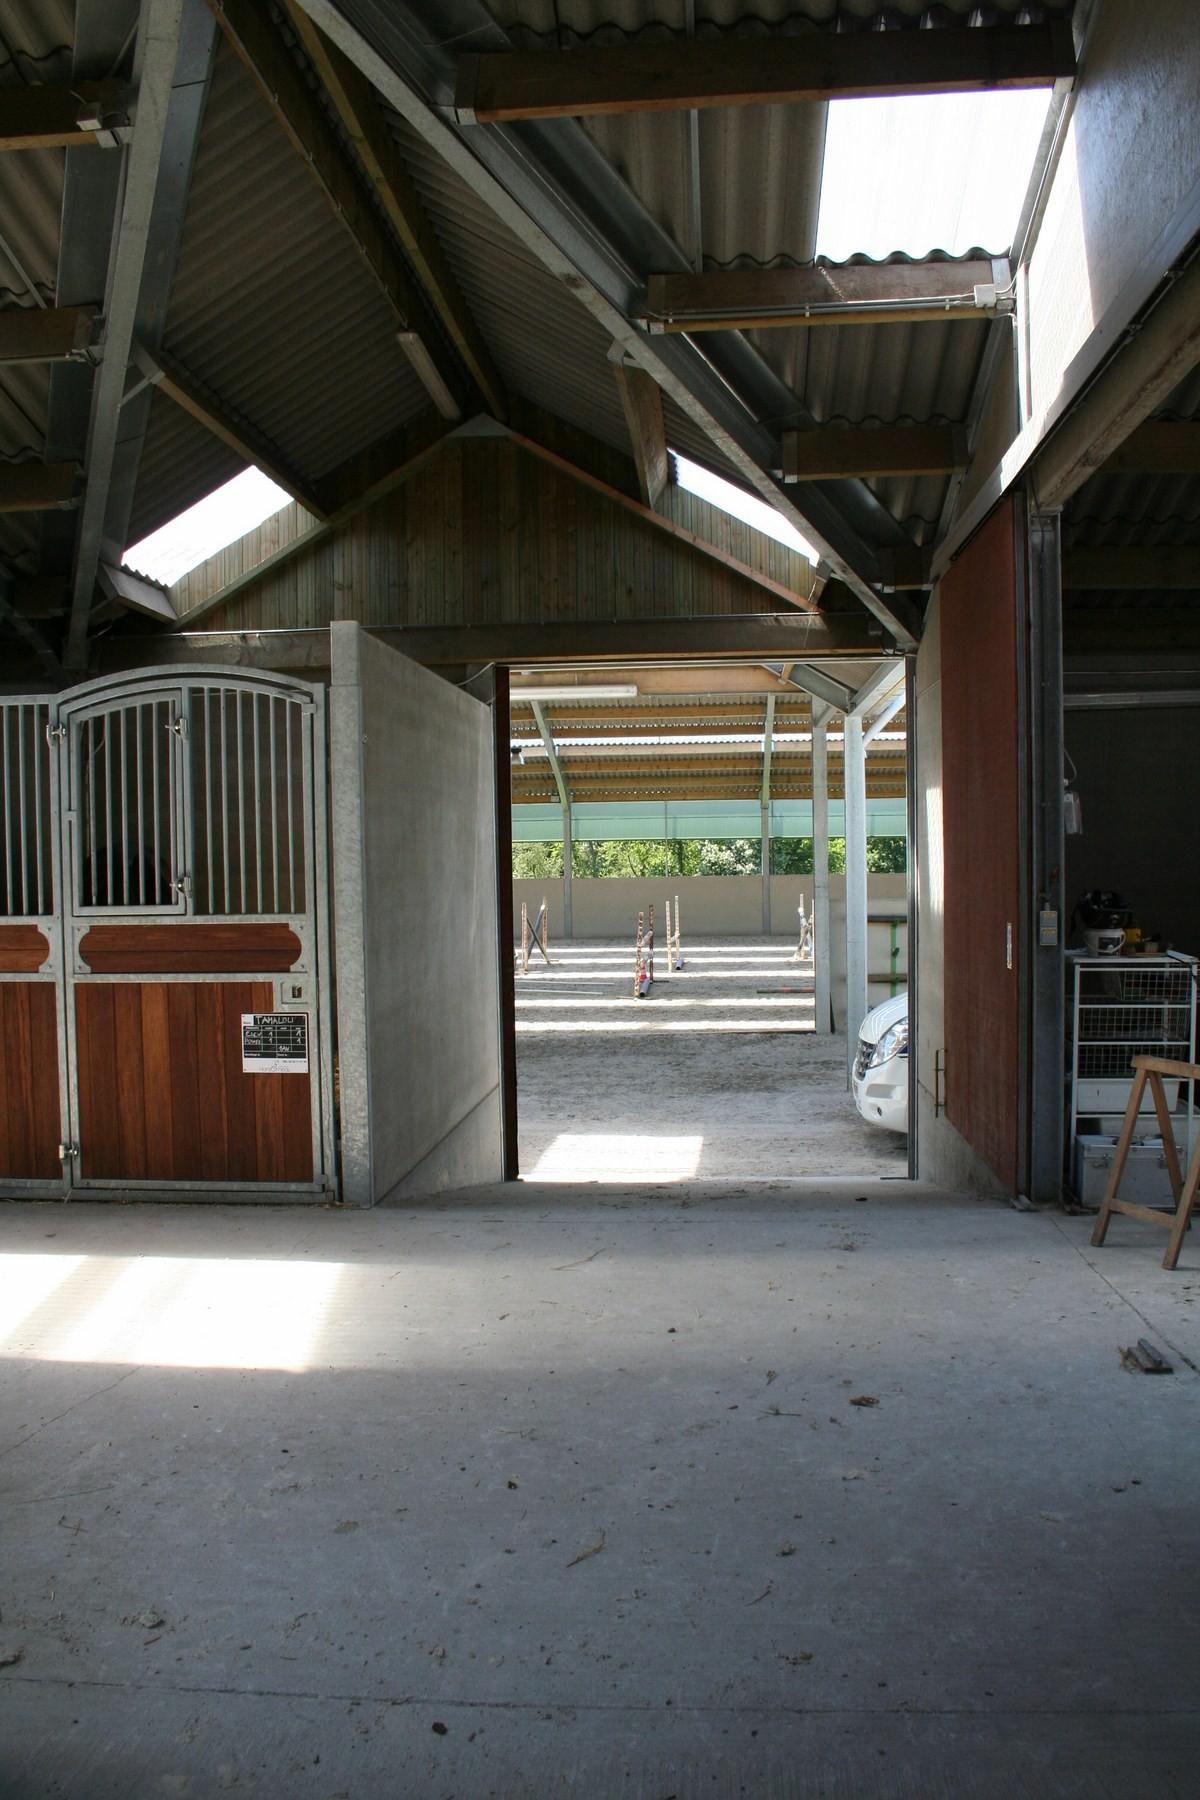 saint hermelle_paardenstallen_paardenboxen_binnenpiste_gouy les Pieton (16).jpg